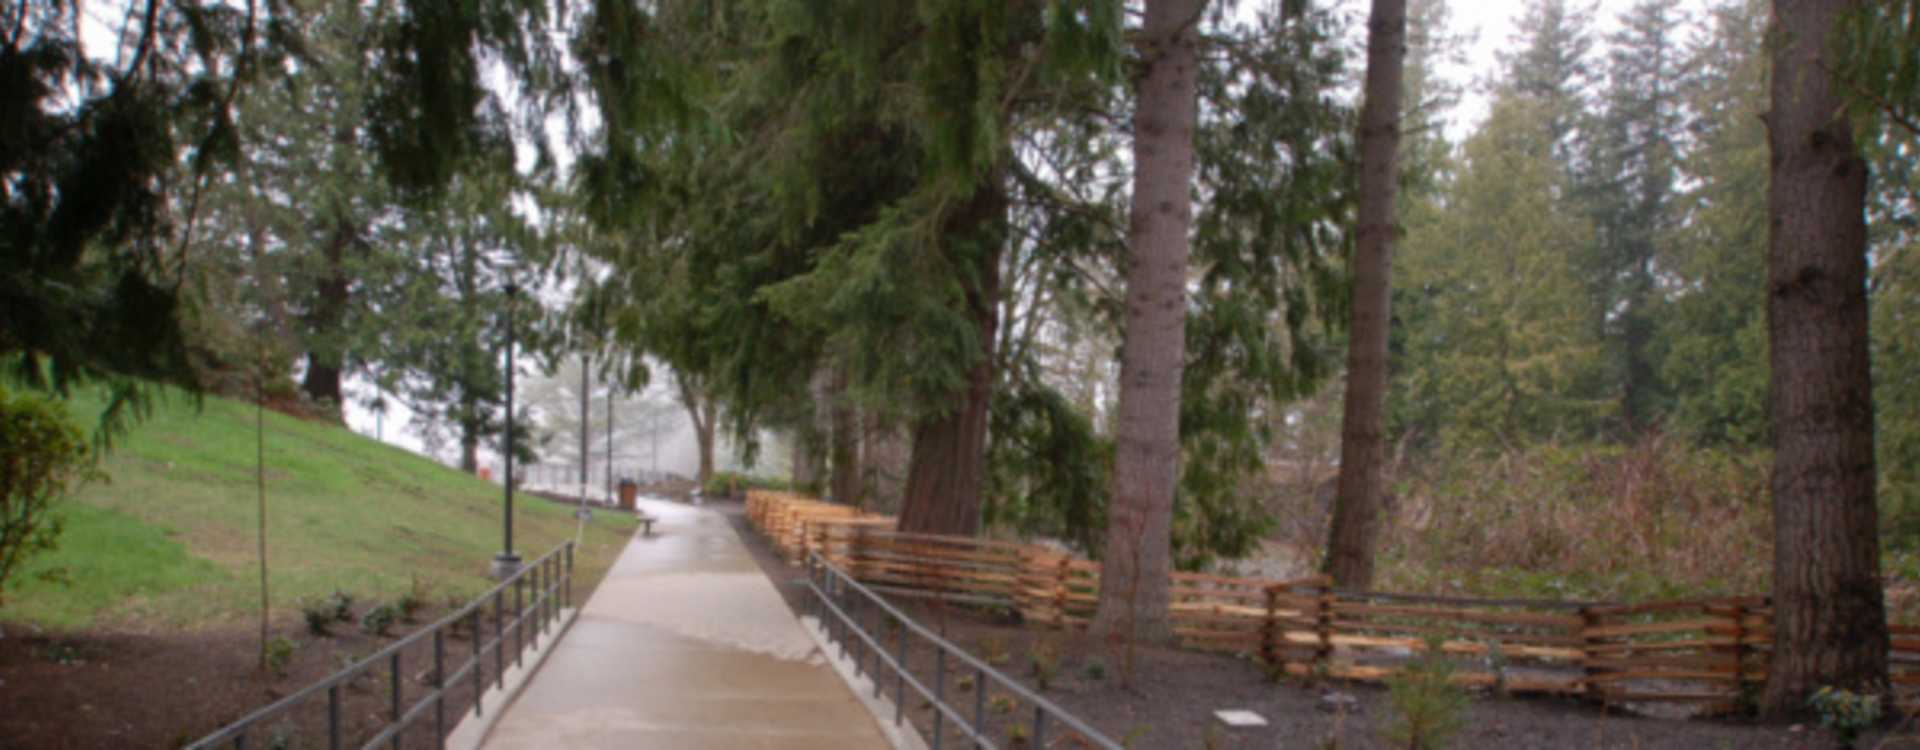 Snoqualmie_Falls-4.jpg